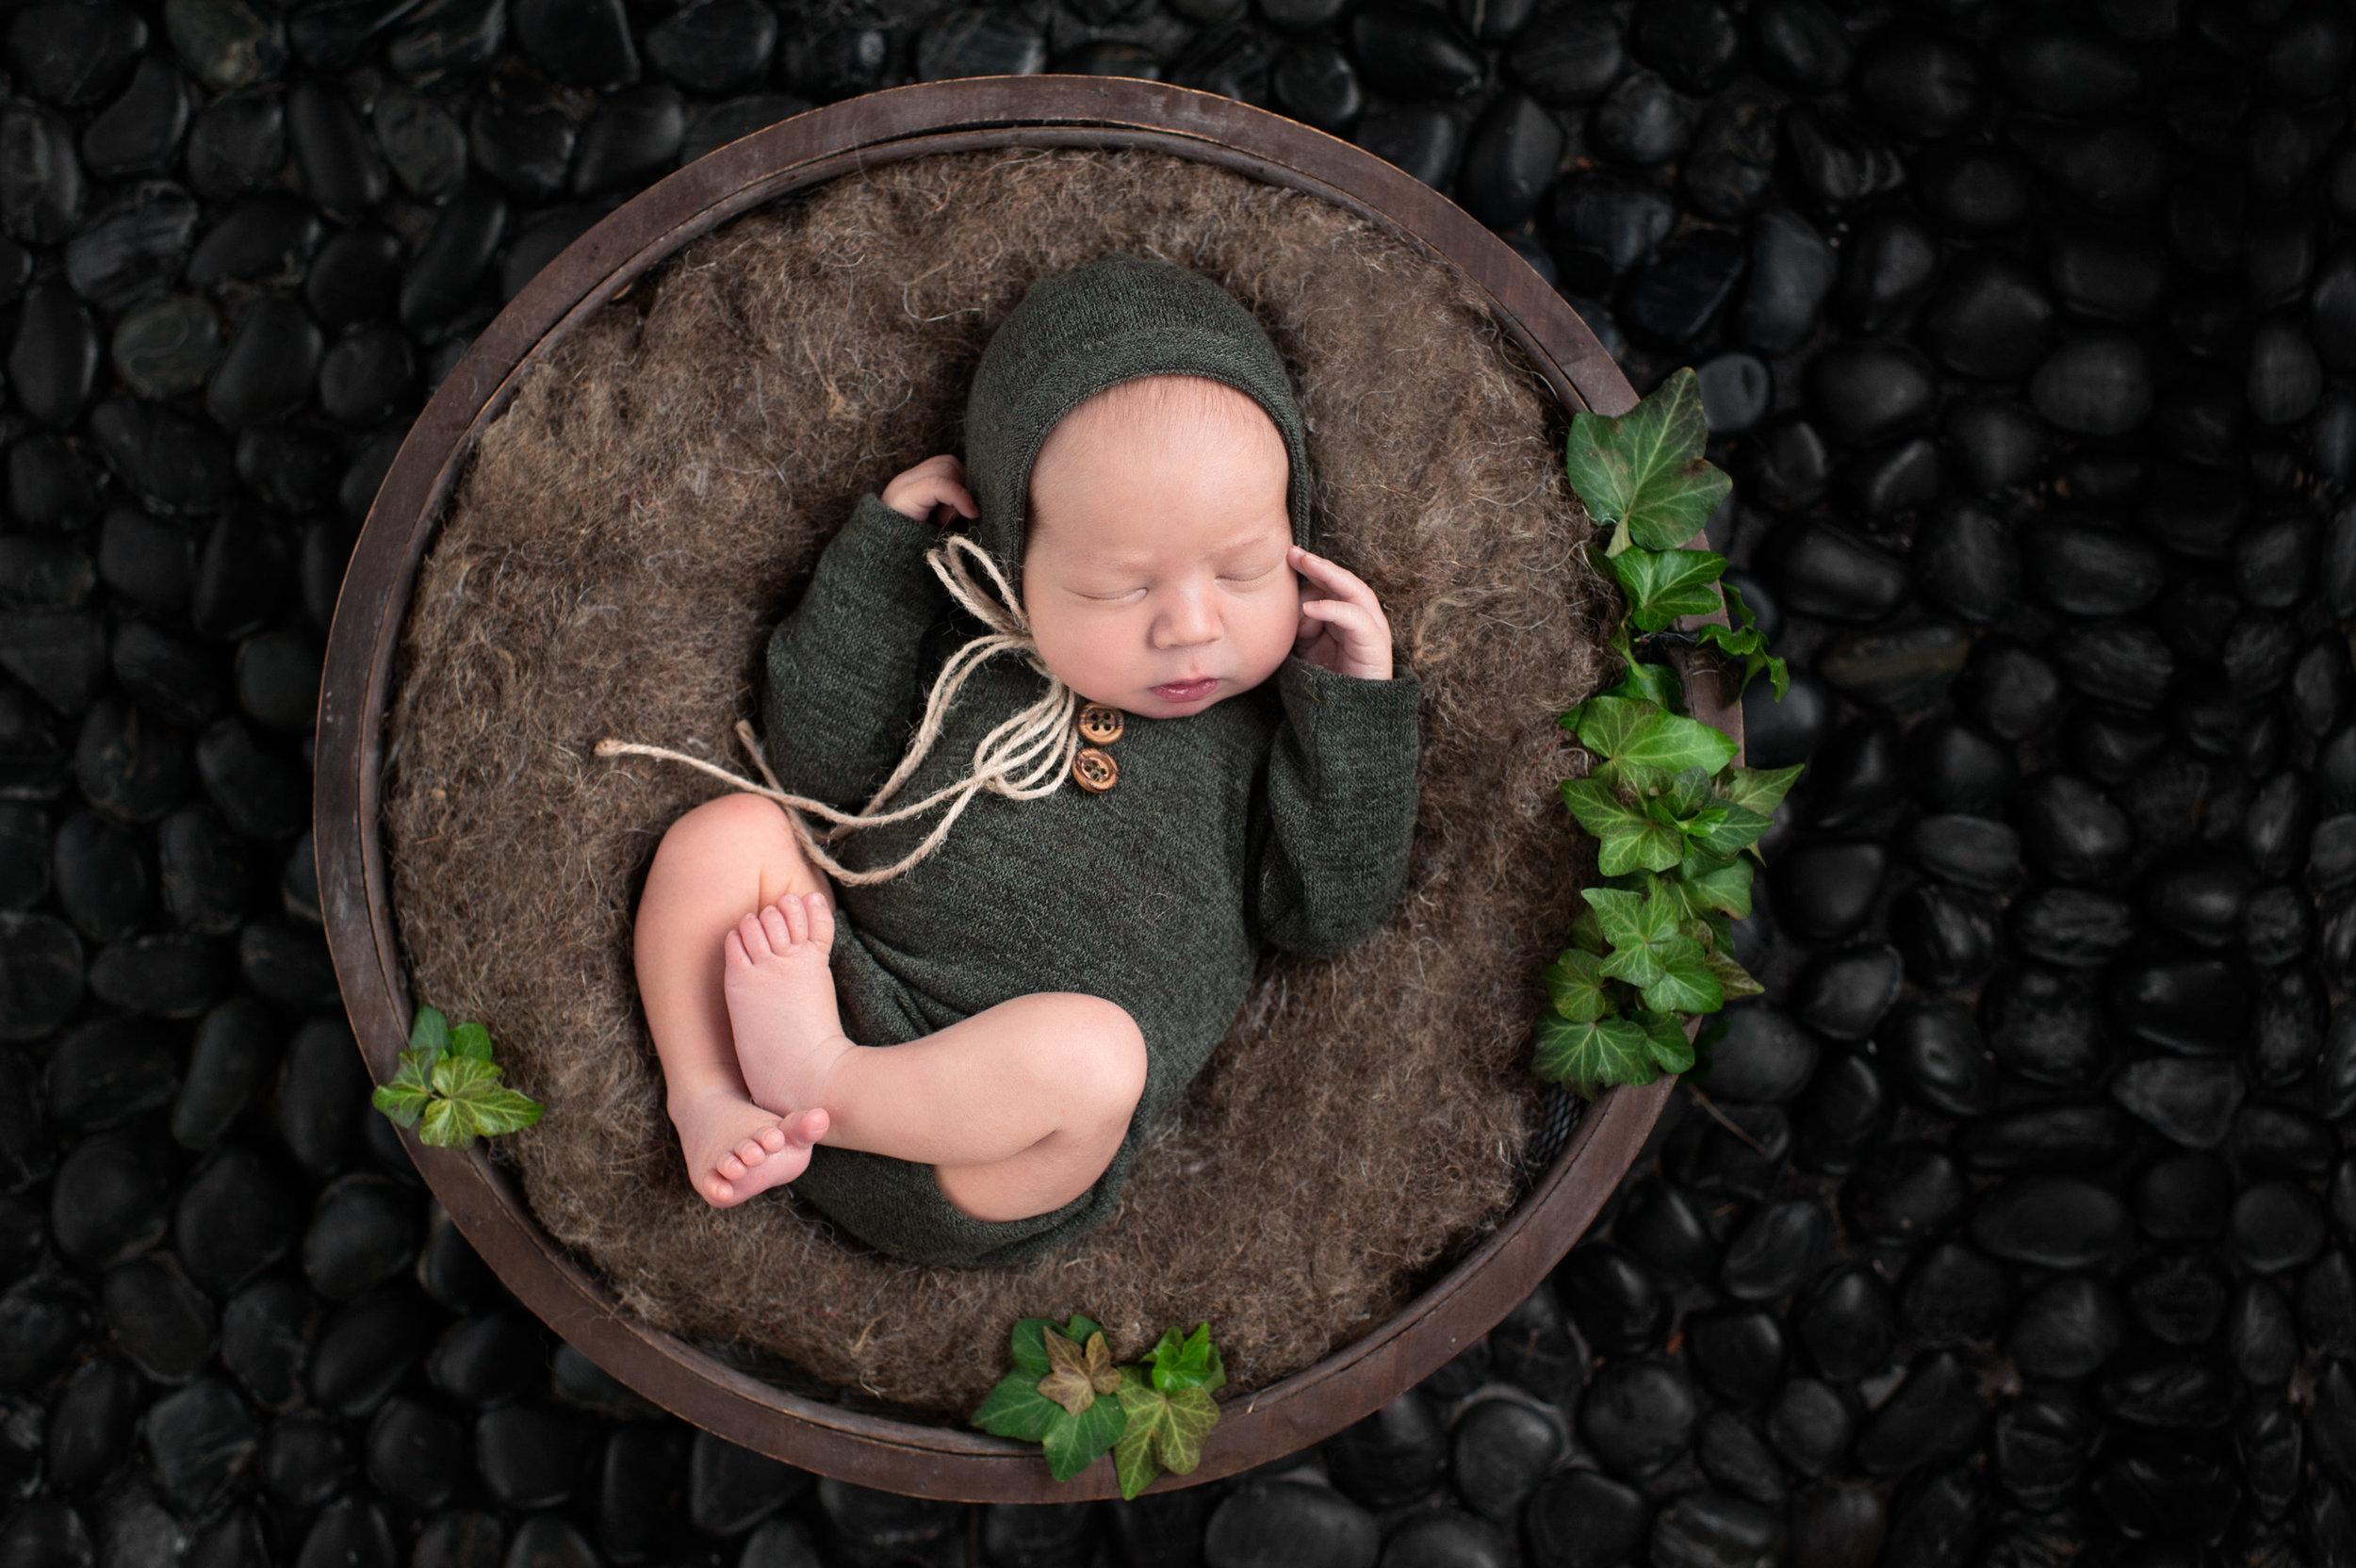 fairfield county newborn photography